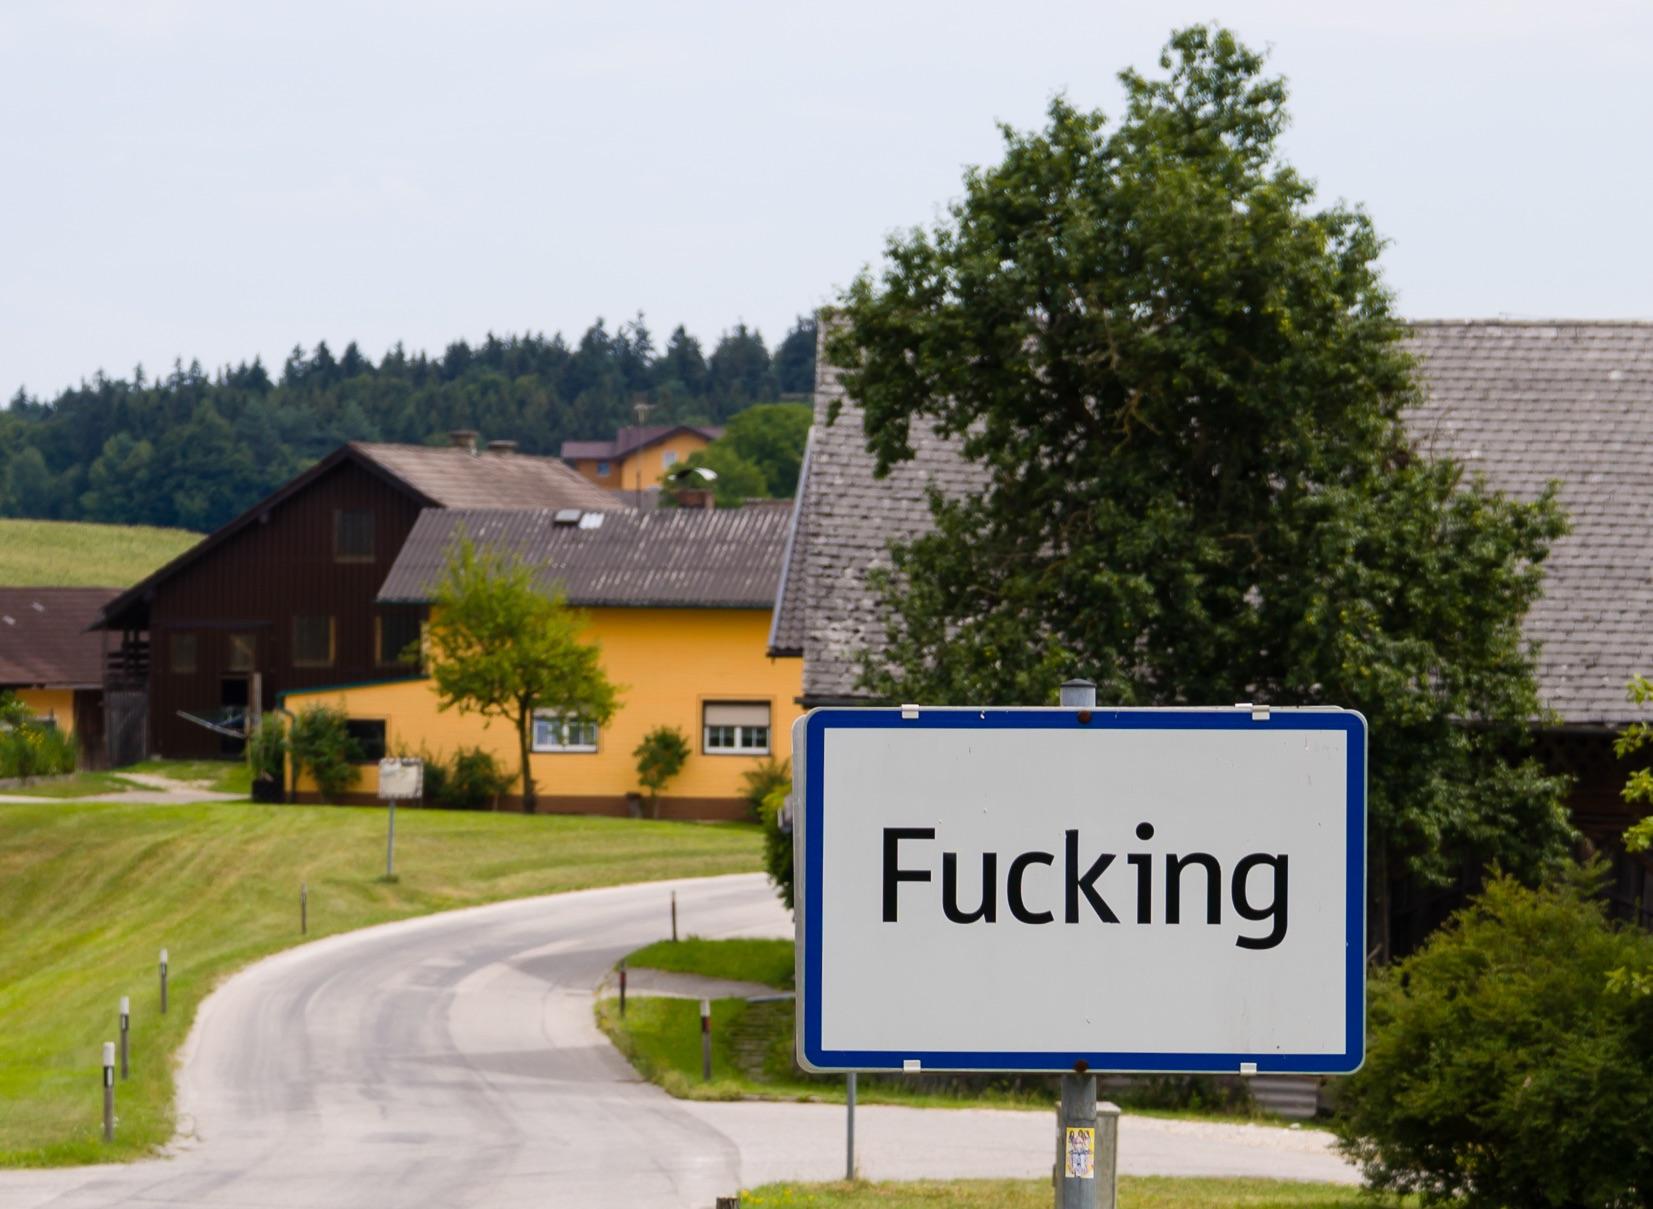 Fugging Unbelievable! Austrian Village to Ditch Unfortunate Obscene Name